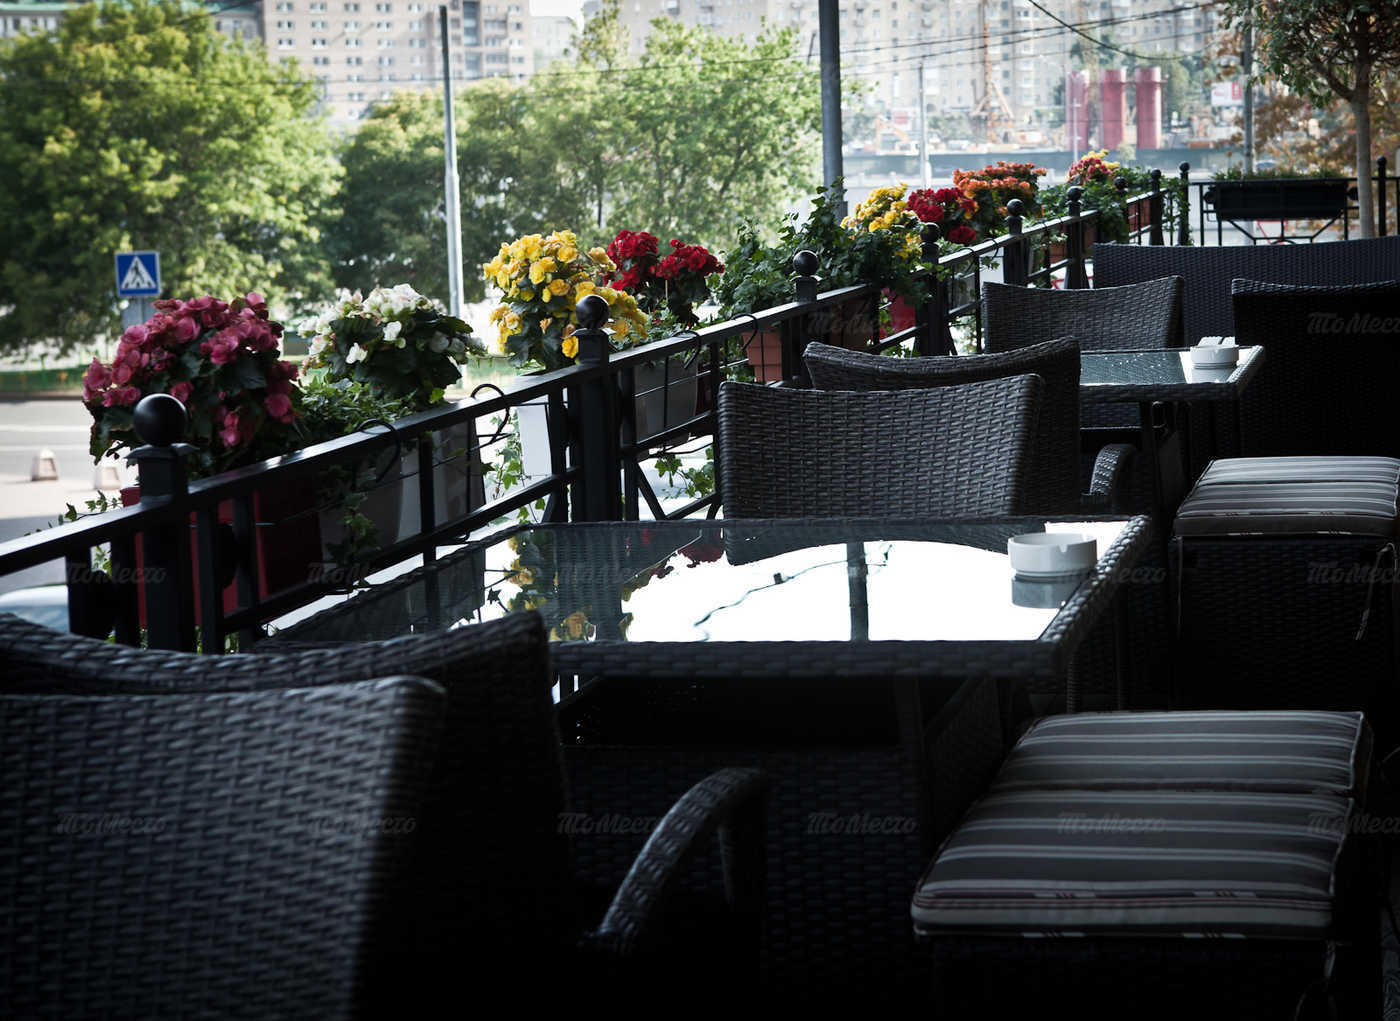 Меню караоке клуба, ресторана Barry White (Барри Вайт) в Глубоком переулке